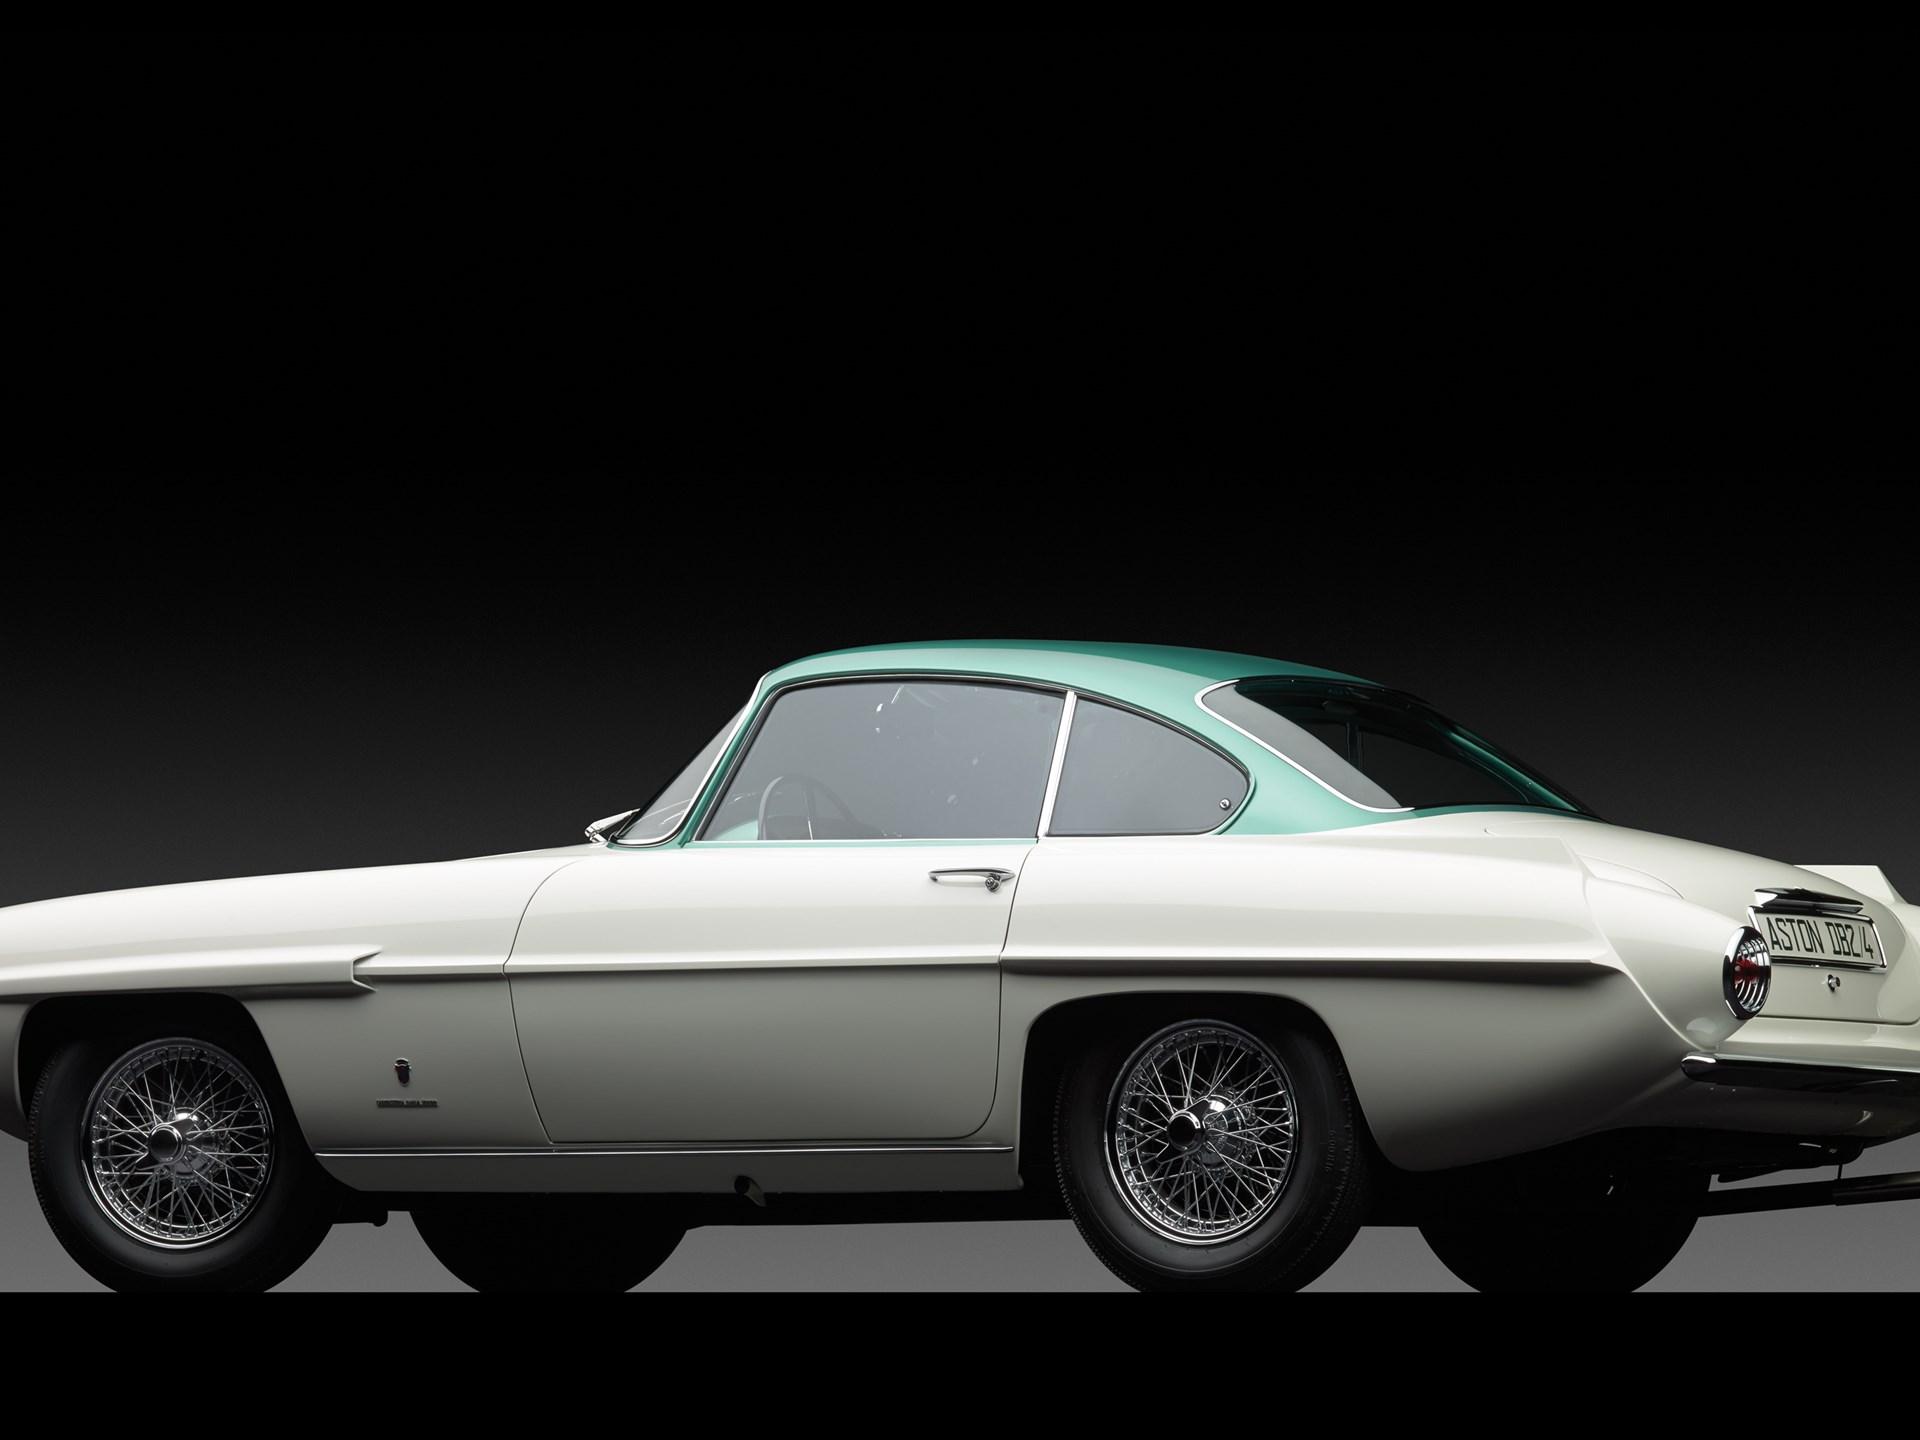 1956 Aston Martin DB2/4 Mk II 'Supersonic' by Carrozzeria Ghia